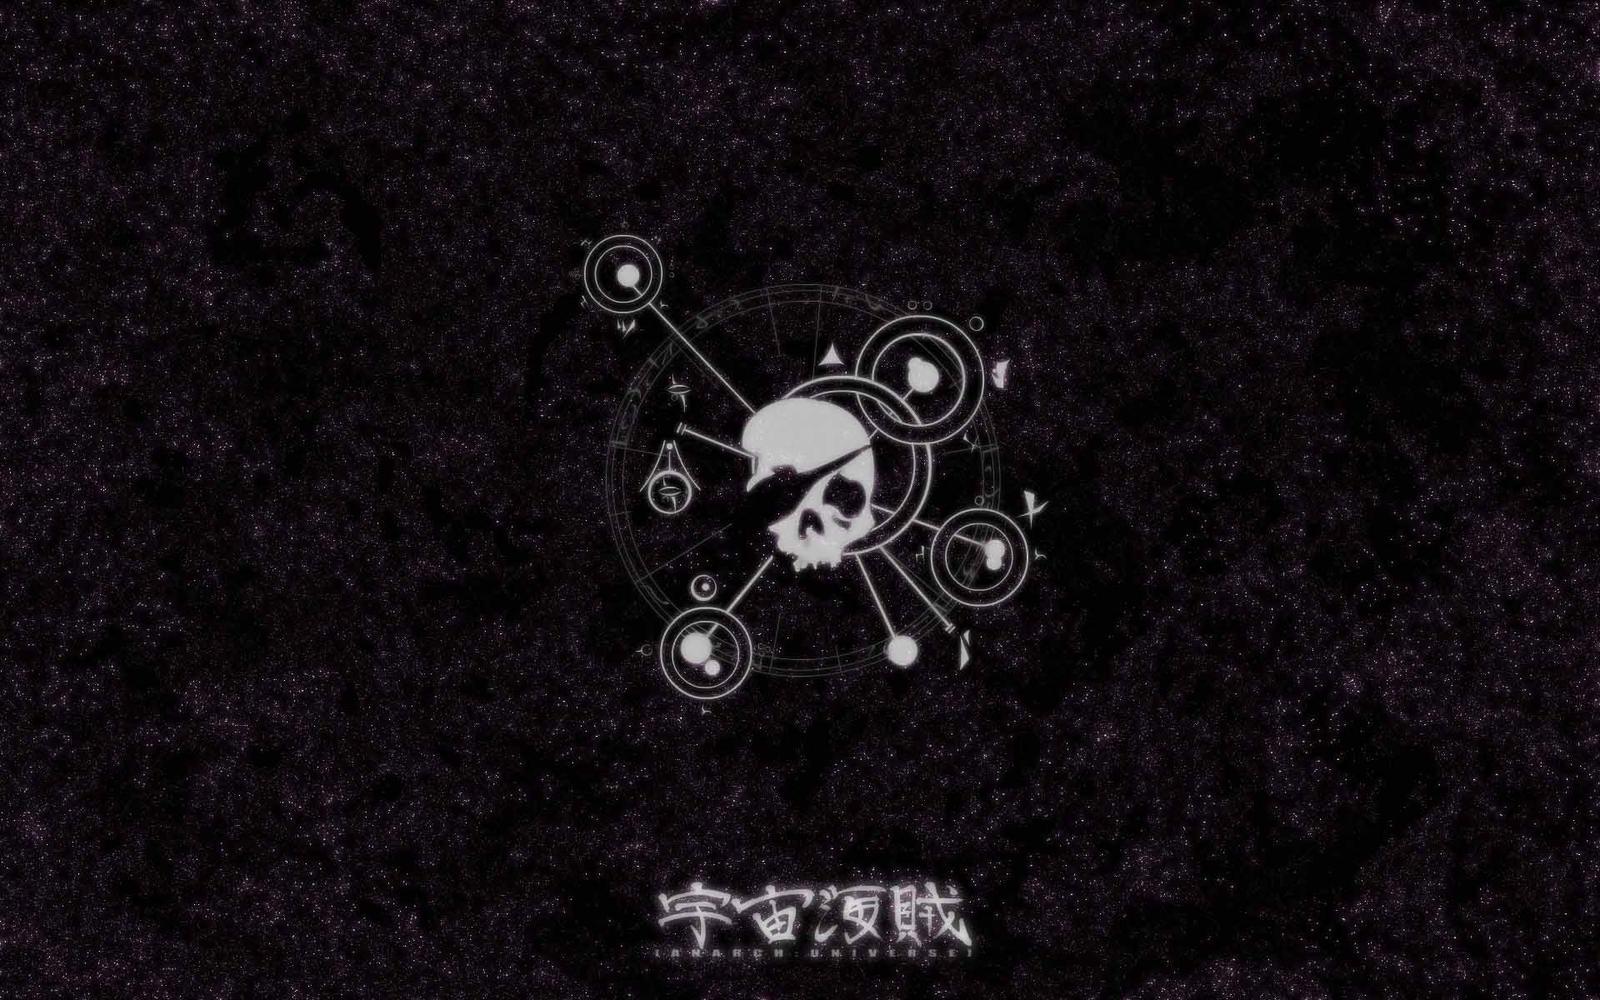 UKZ:AU Wallpaper - Jolly Roger